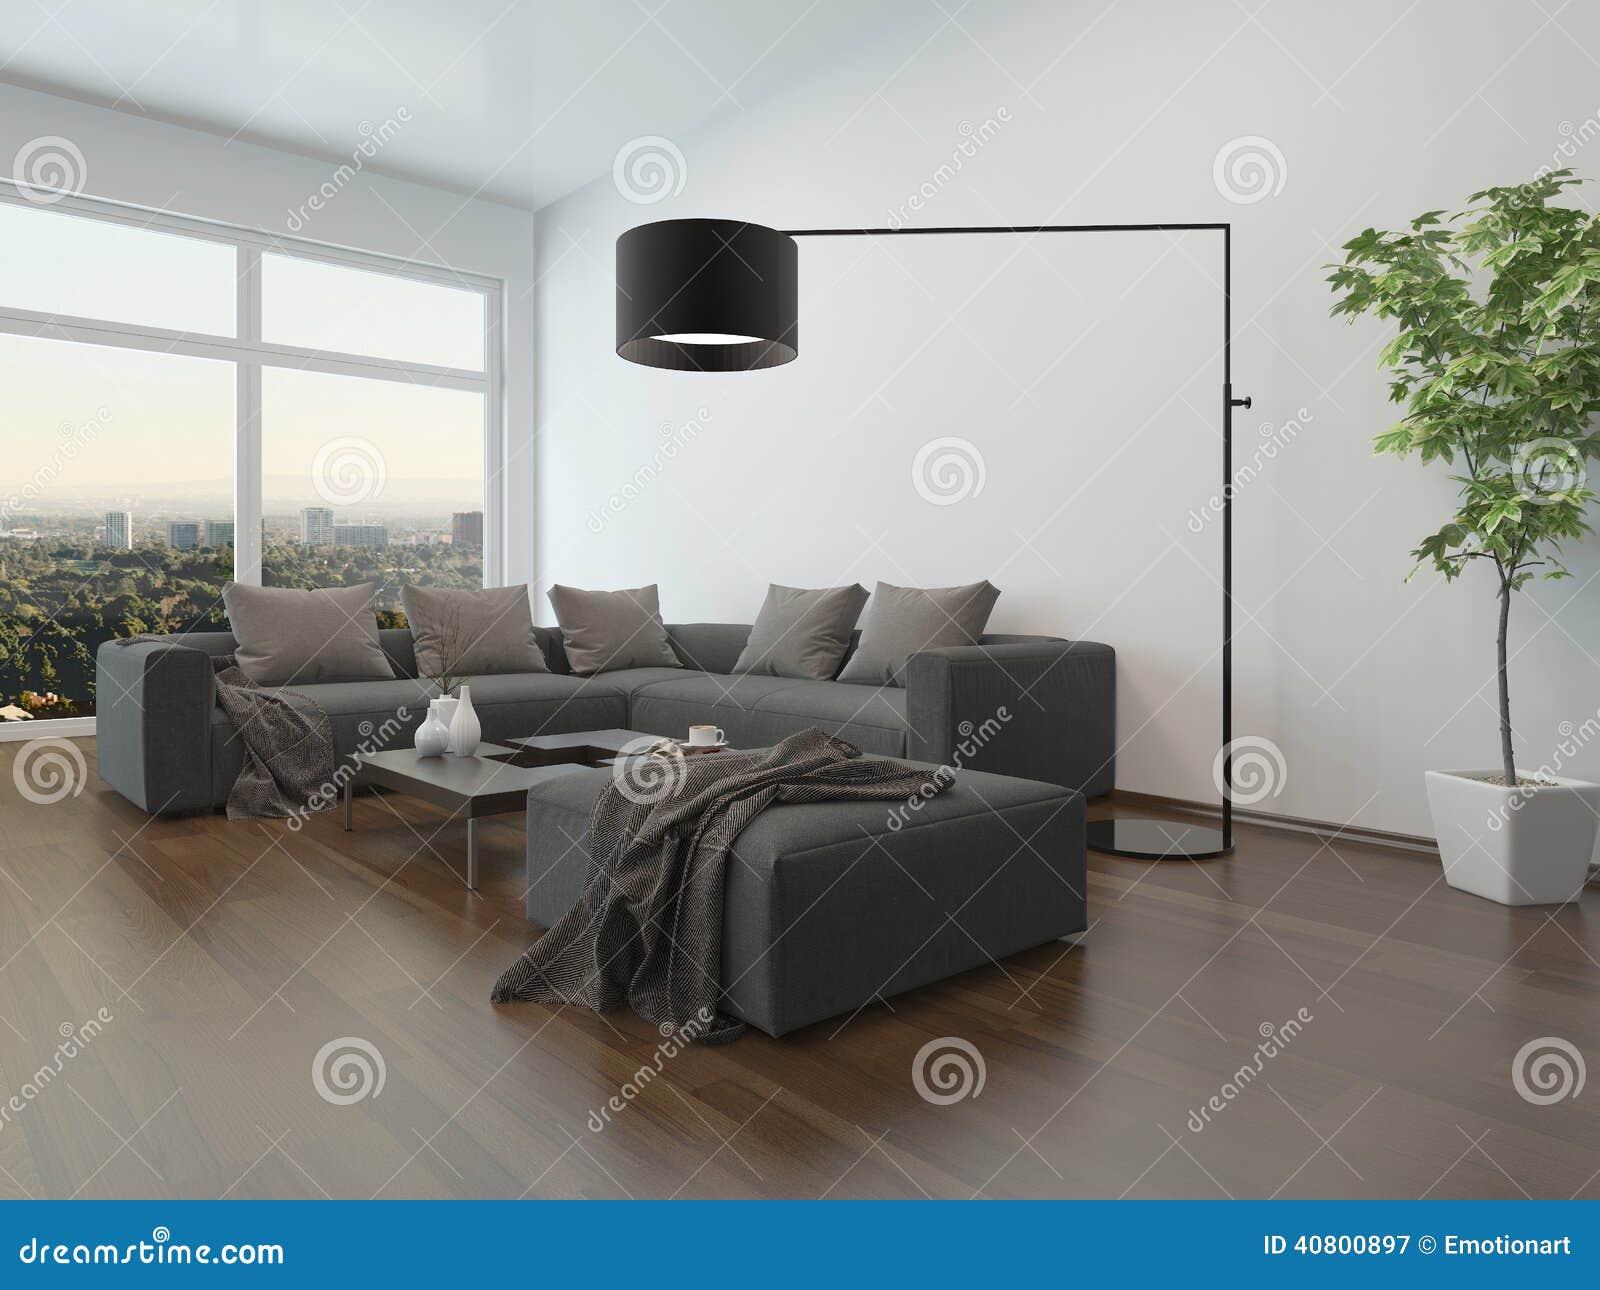 Woonkamer binnenlands w grijze laag en staande lamp stock for Wohnzimmer couch